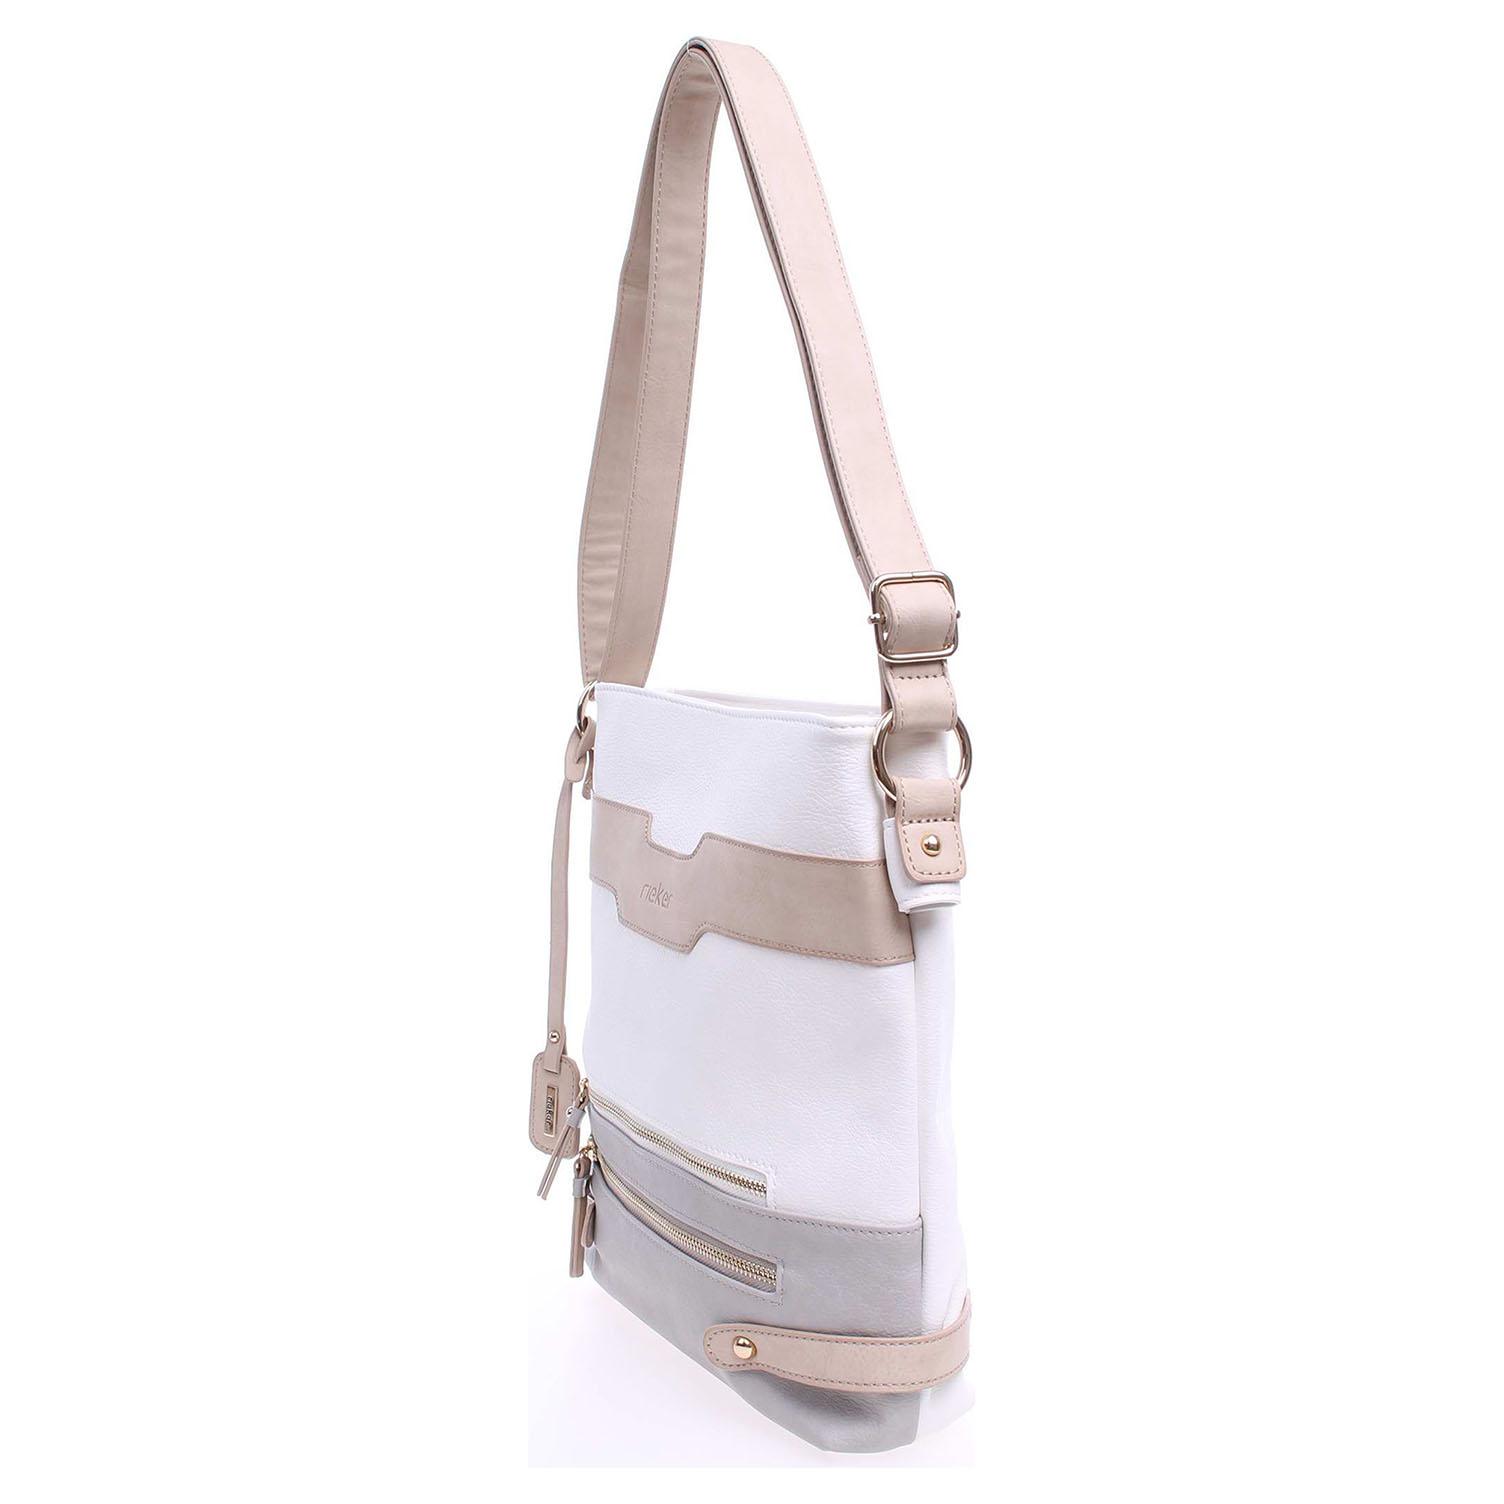 Ecco Rieker dámská kabelka H1037-80 bílá-béžová 11890903